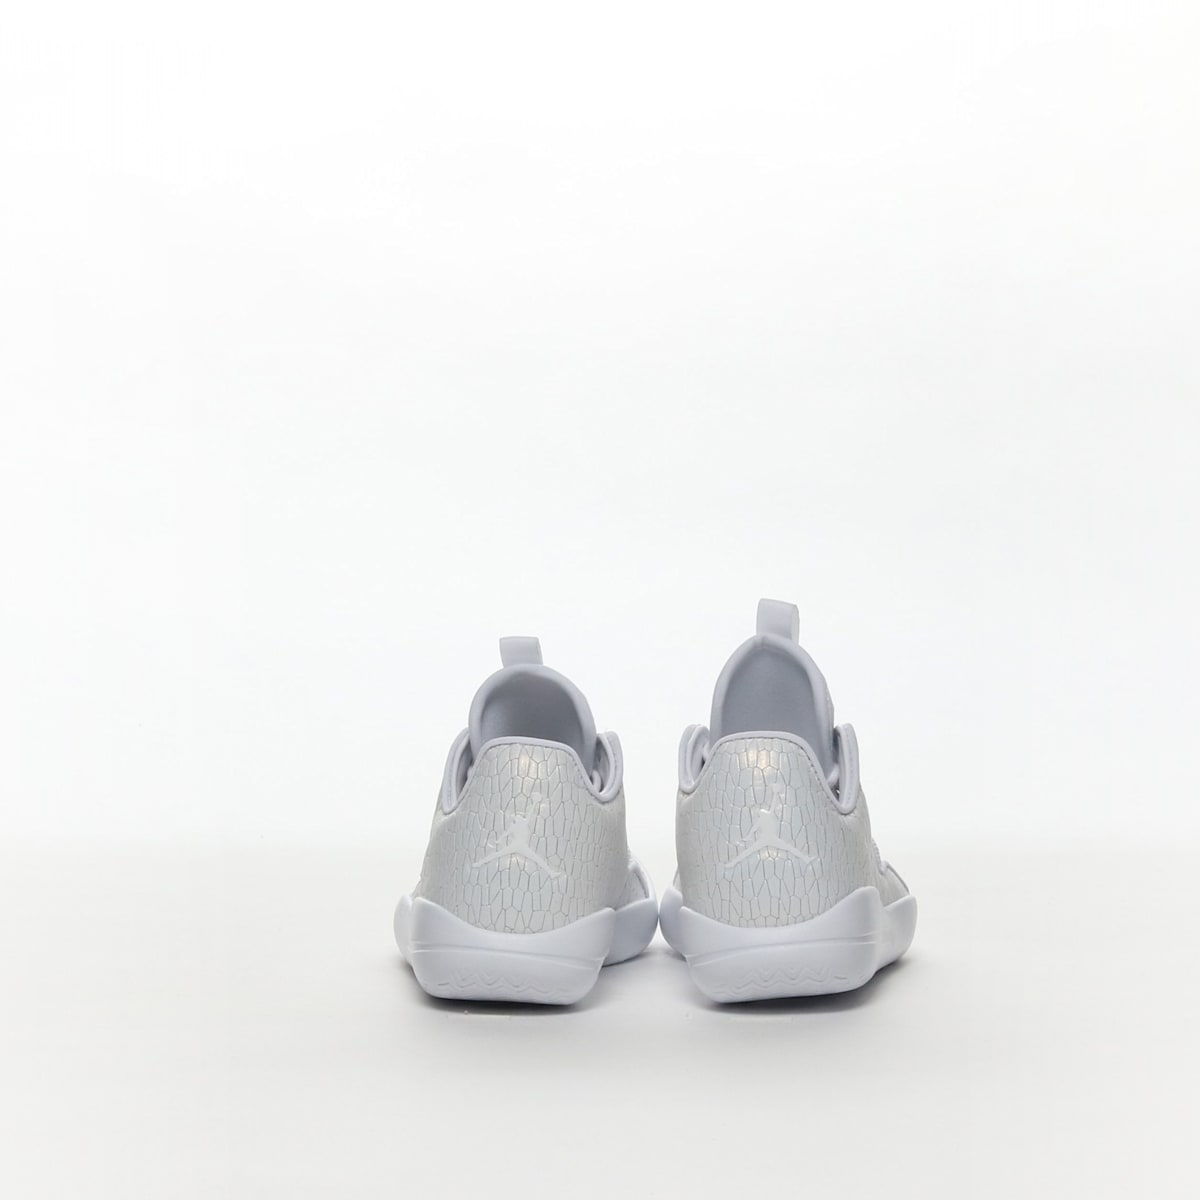 JORDAN ECLIPSE PREM HC GG - WHITE WHITE – Resku 4cbd36465